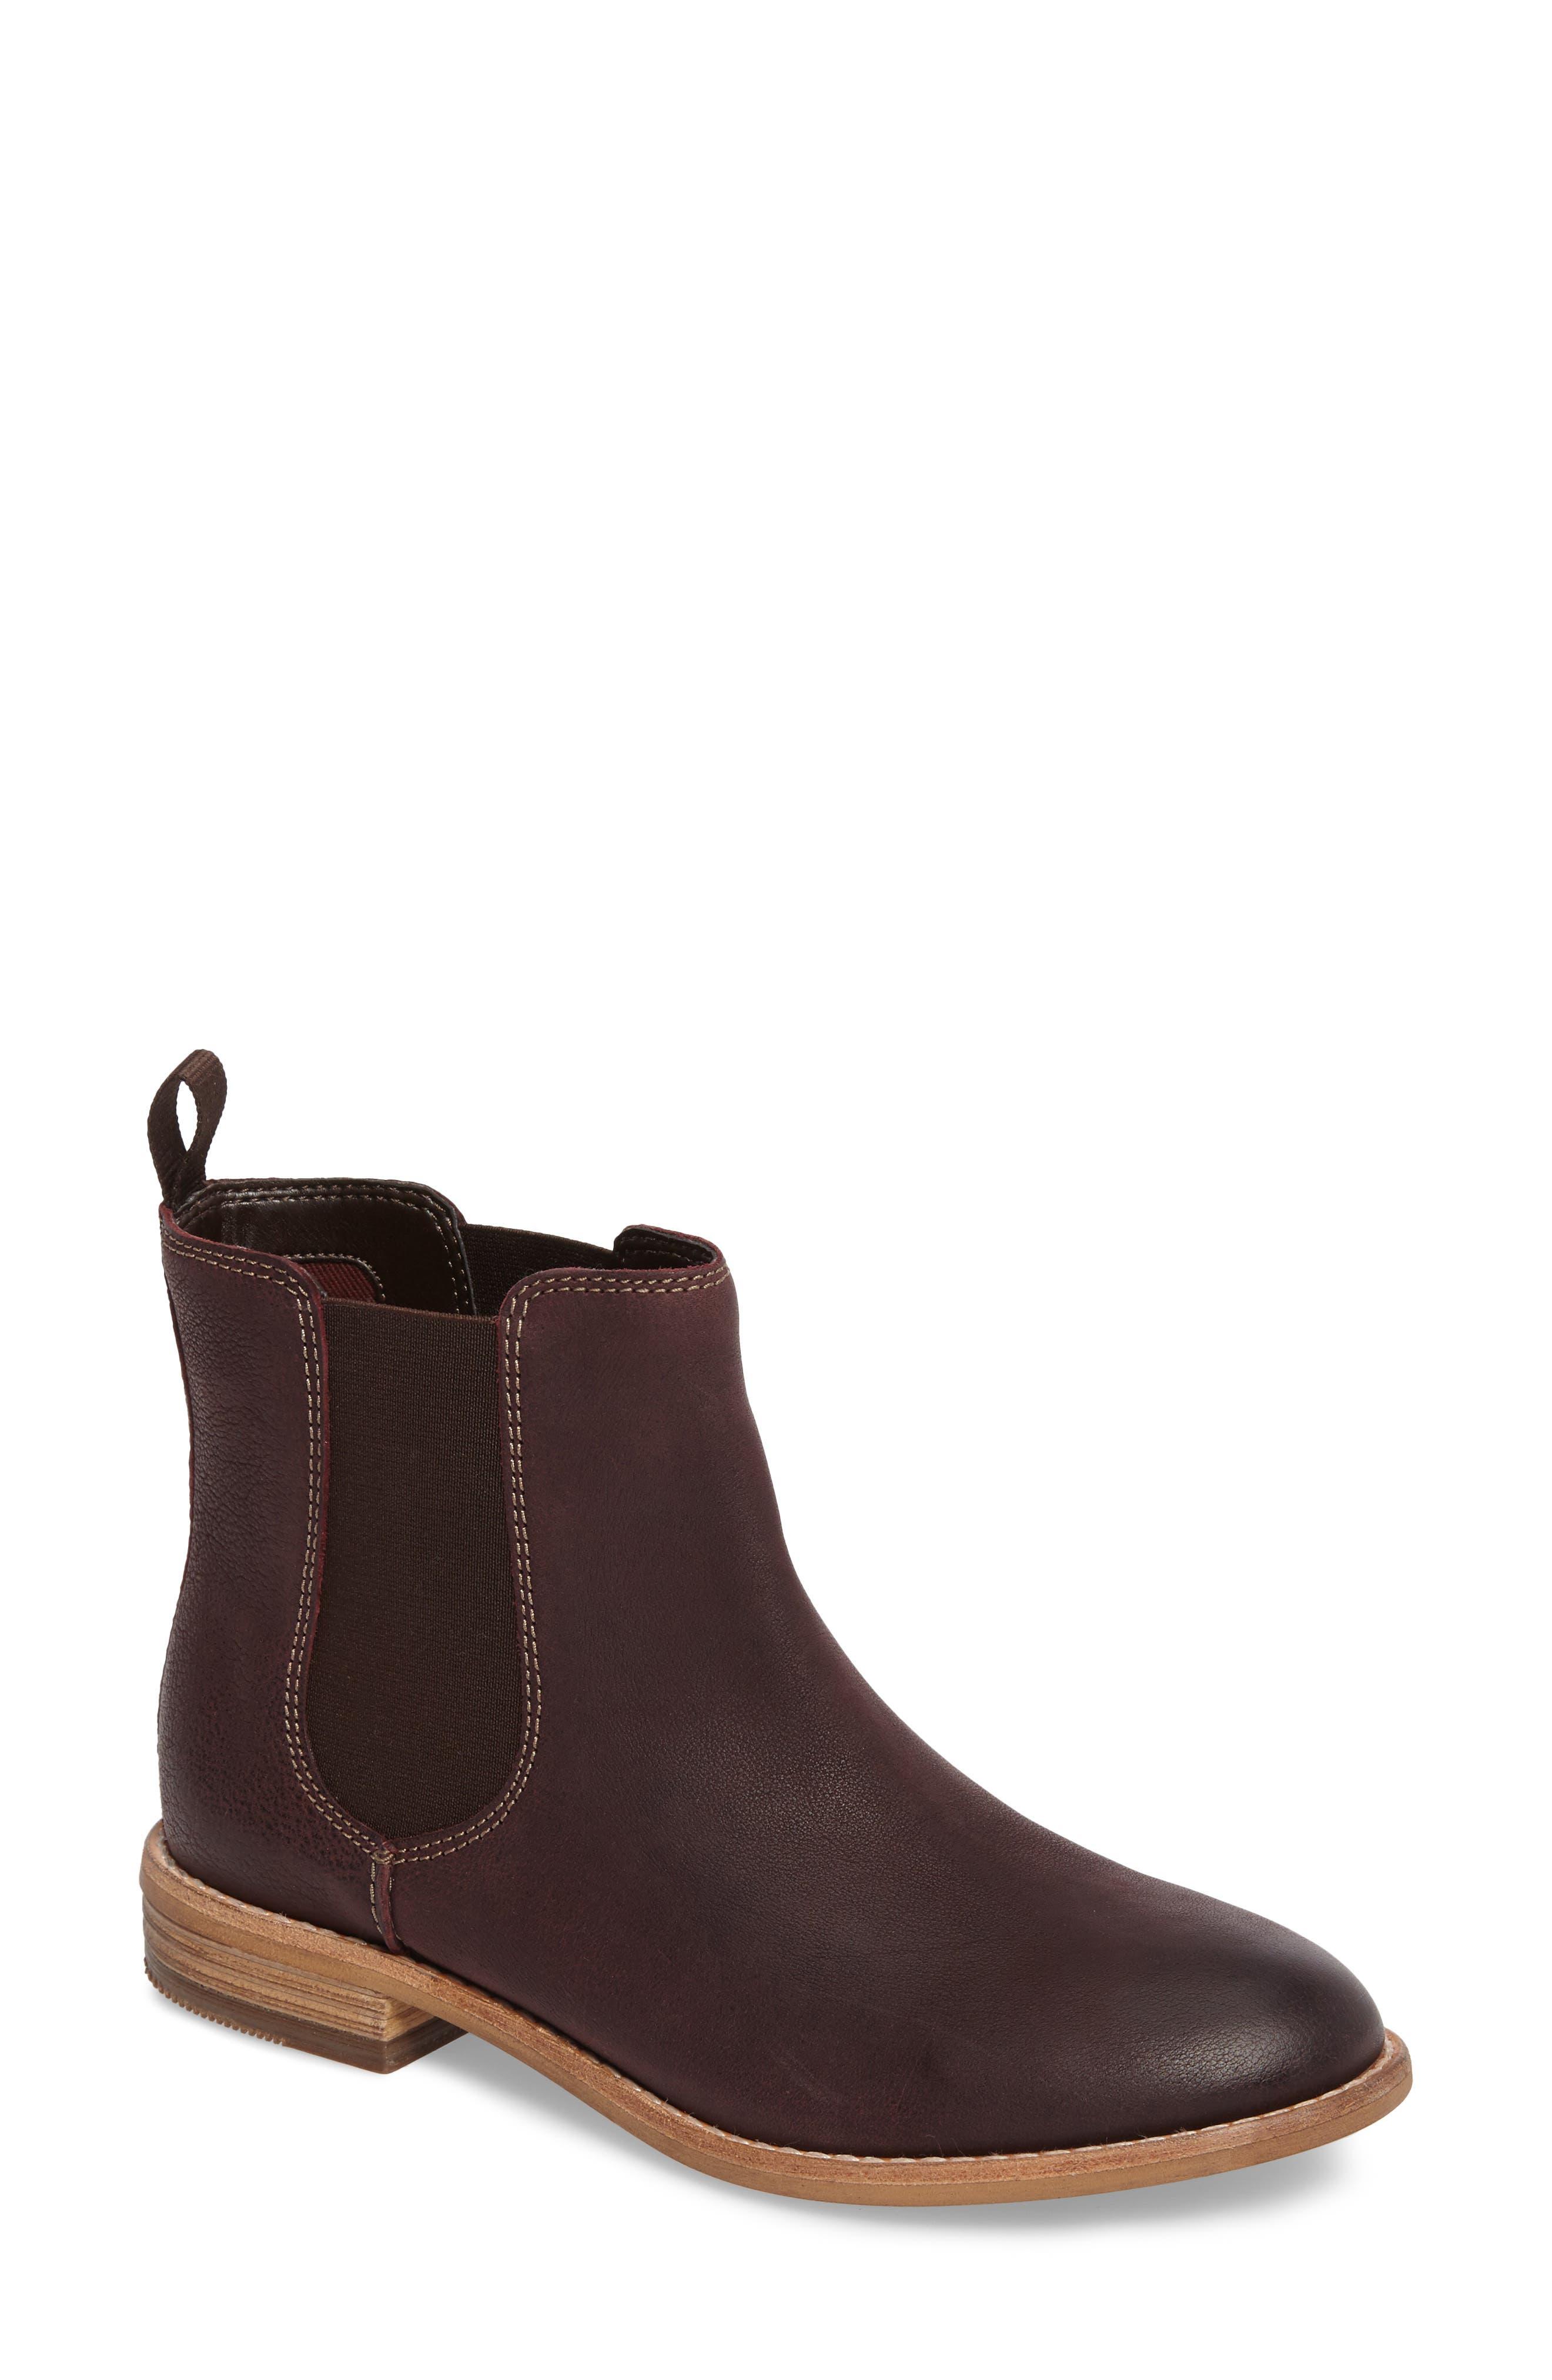 Maypearl Nala Bootie,                         Main,                         color, Burgundy Leather